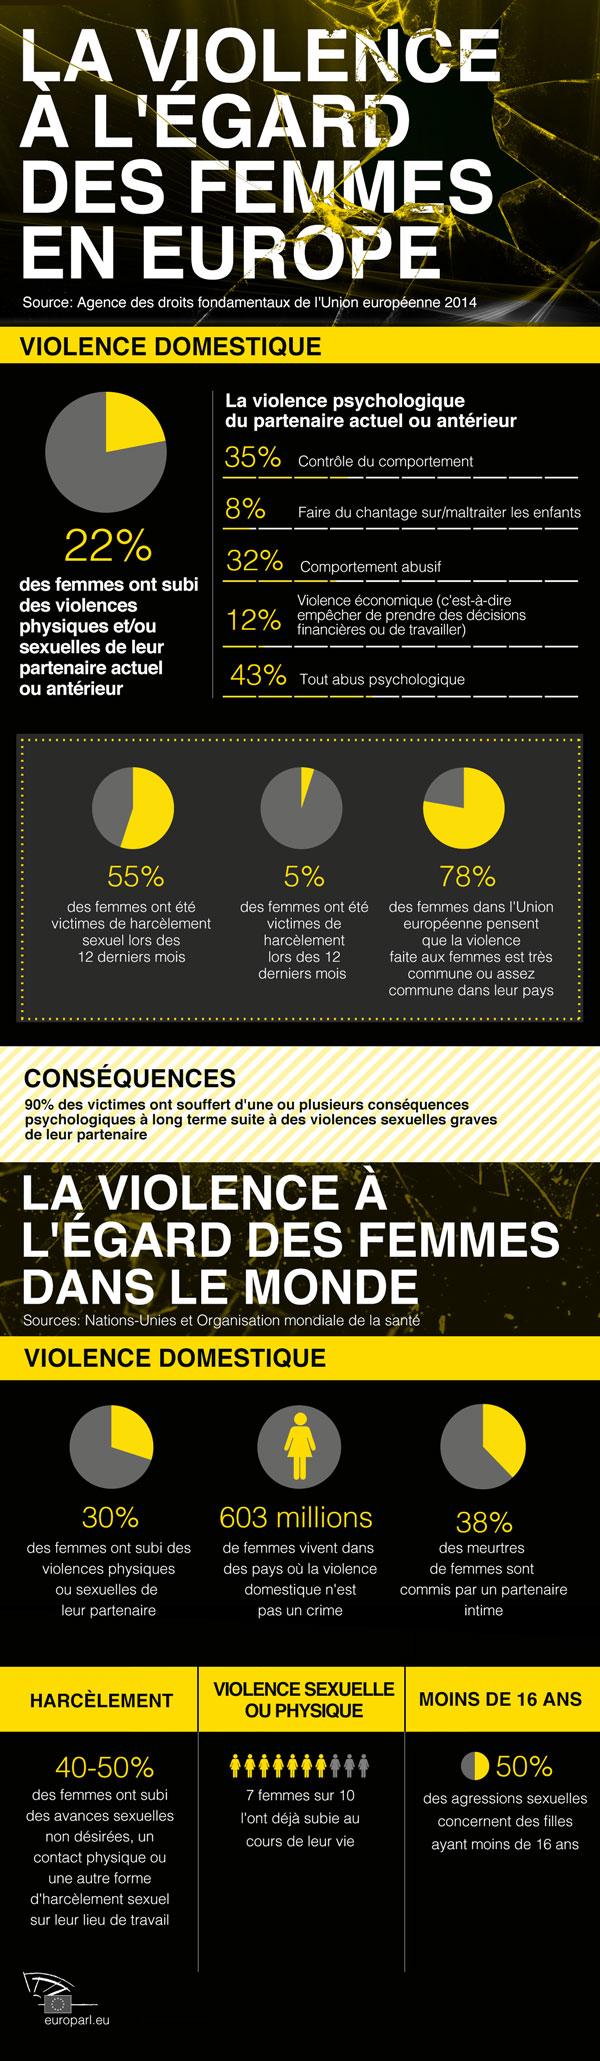 violence l gard des femmes la v rit qui d range actualit parlement europ en. Black Bedroom Furniture Sets. Home Design Ideas